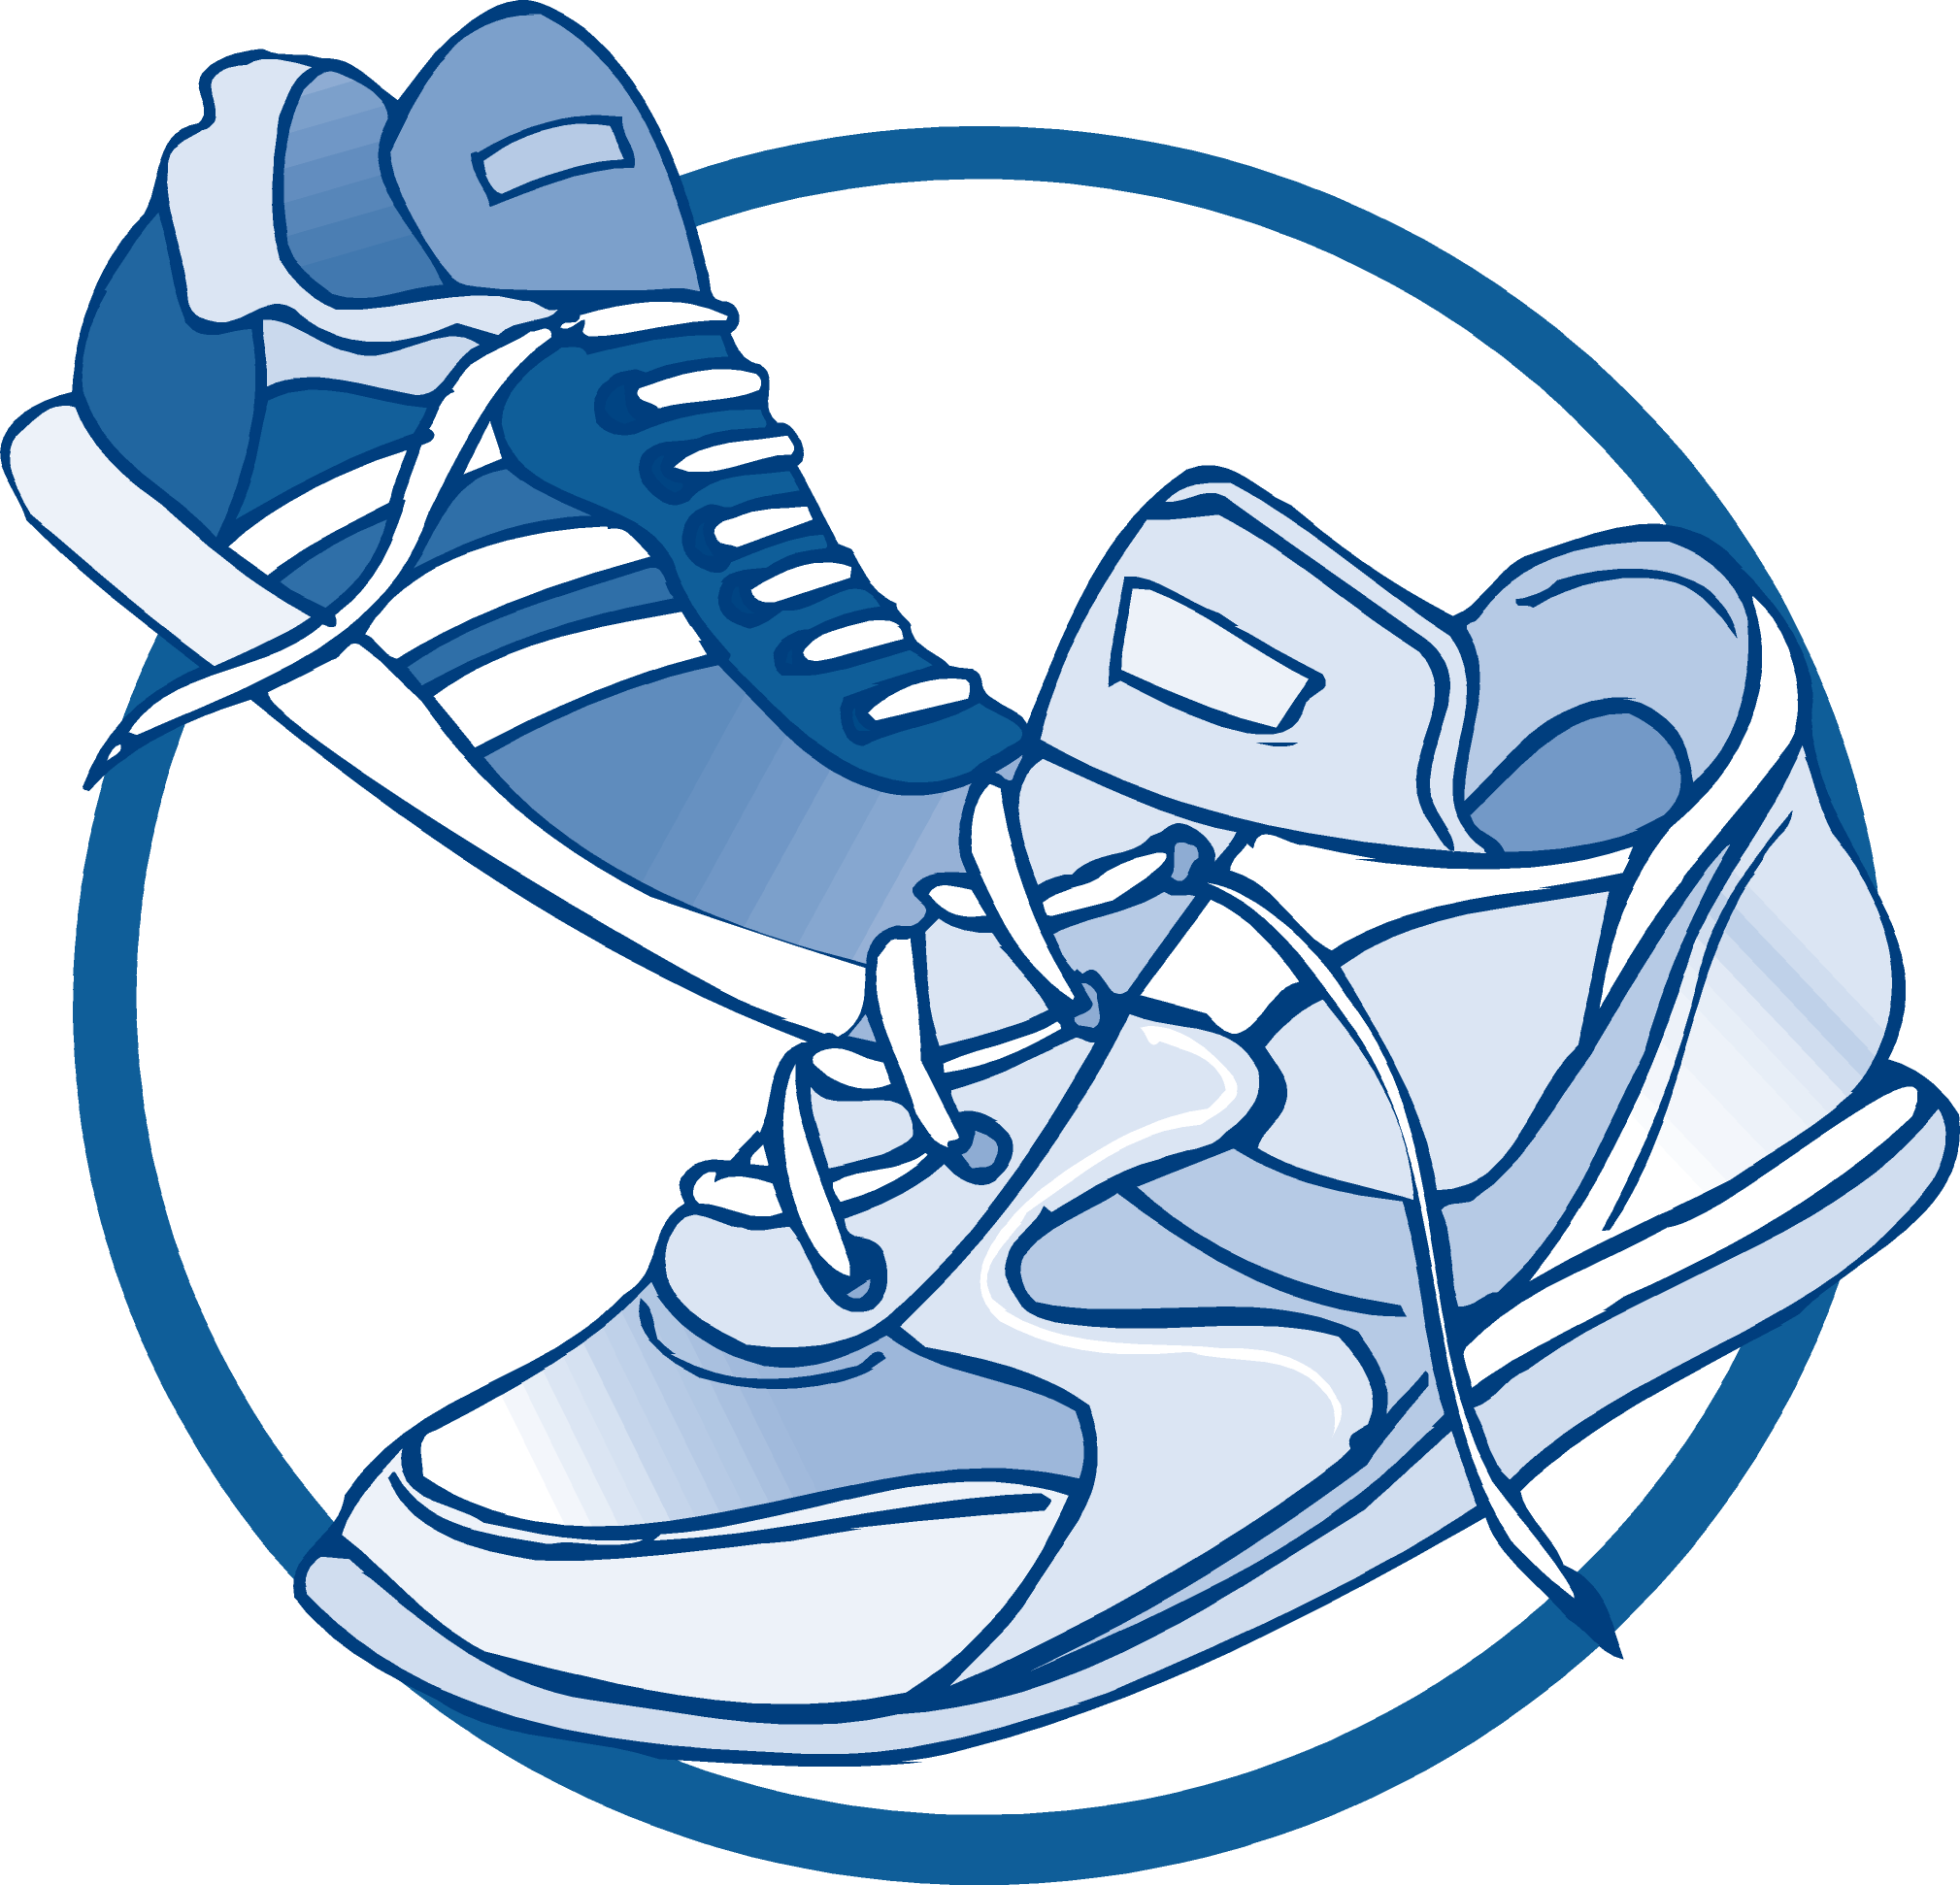 Clothes Closet Clipart | Clipart Library-Clothes Closet Clipart | Clipart library - Free Clipart Images. Sneakers Clip Art Download-3